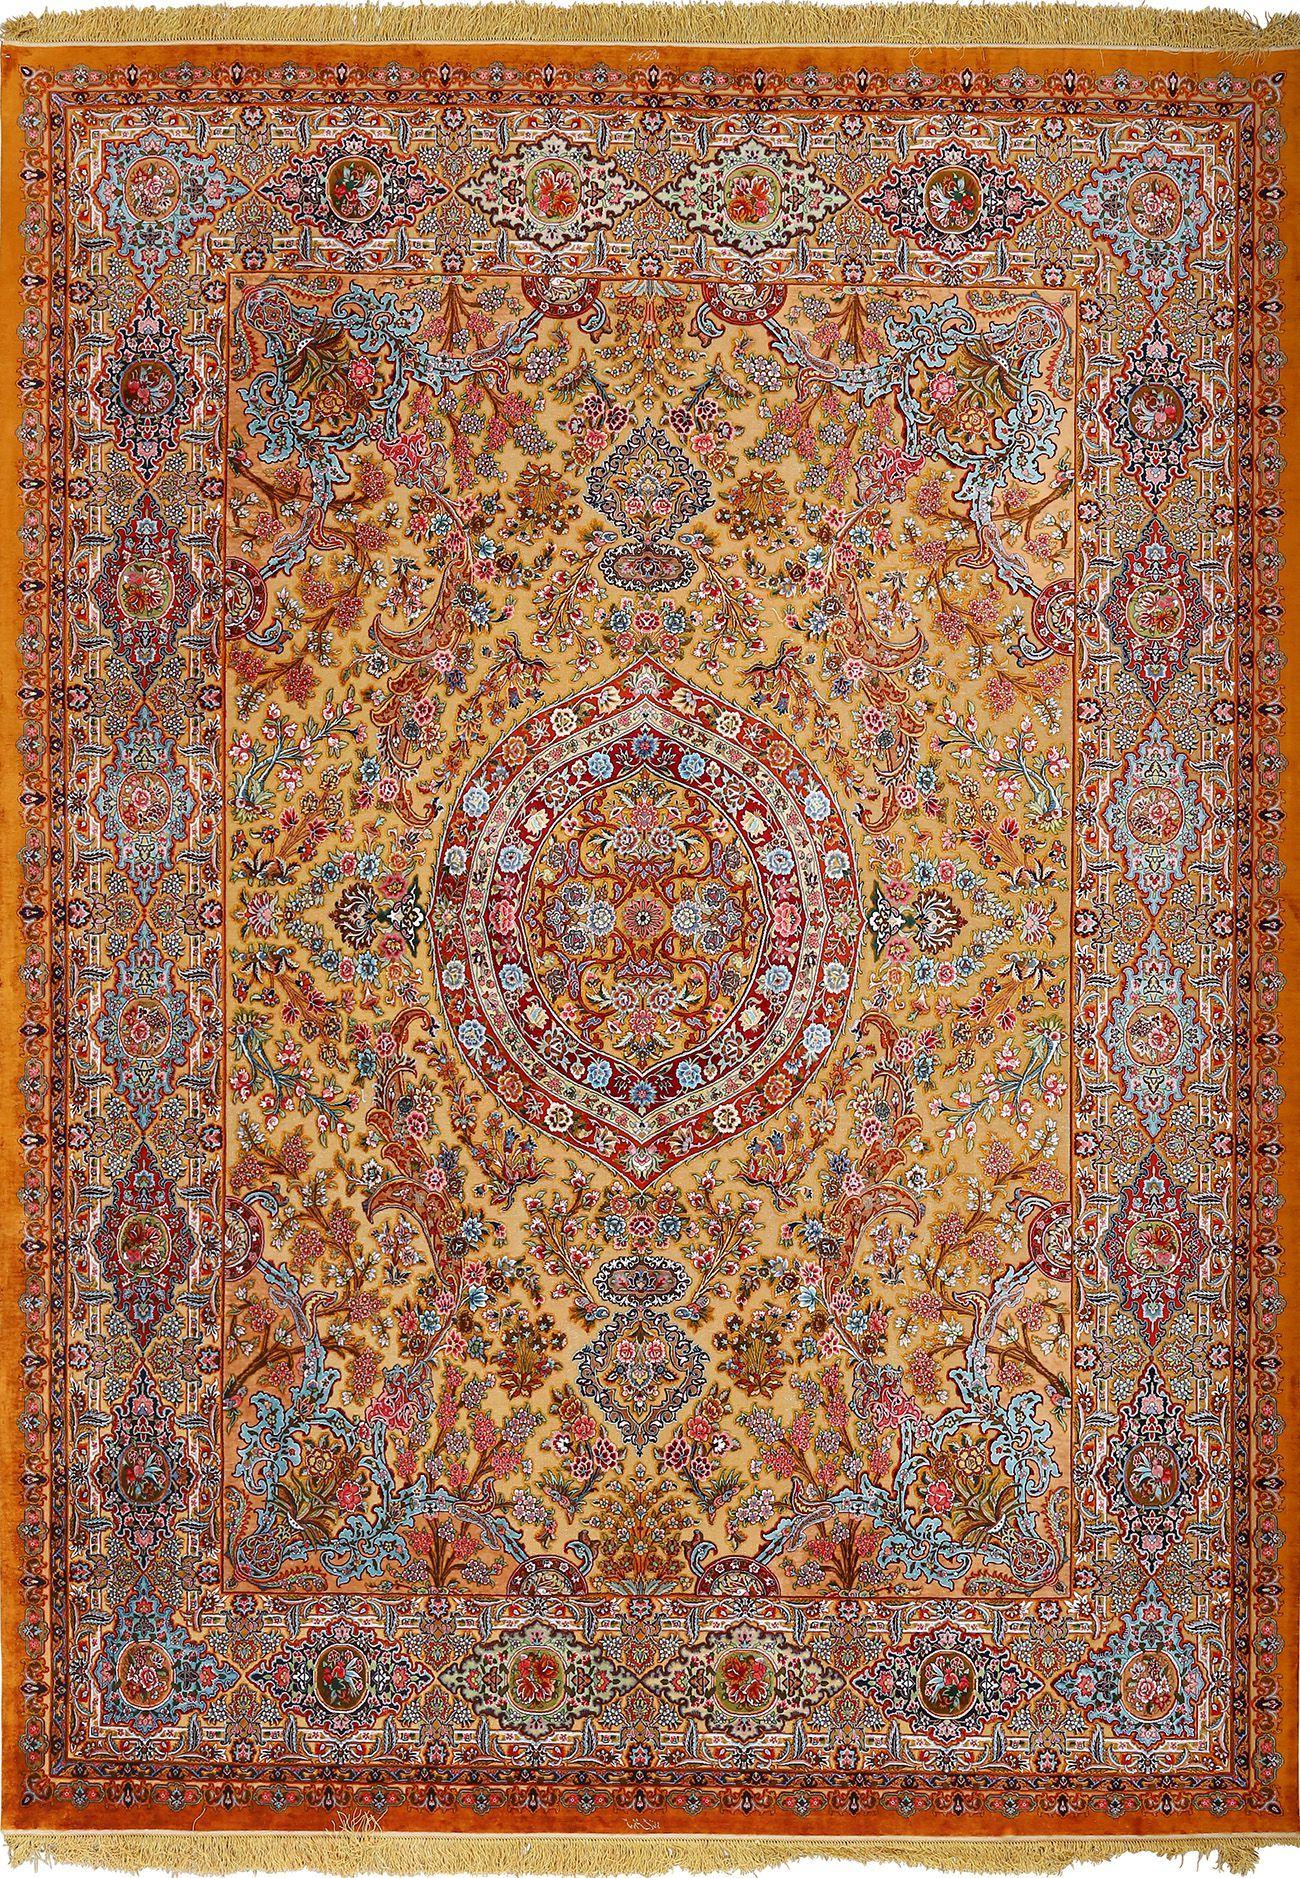 Fine Silk And Gold Thread Vintage Tabriz Persian Rug 51055 Nazmiyal Halilar Hali Antika